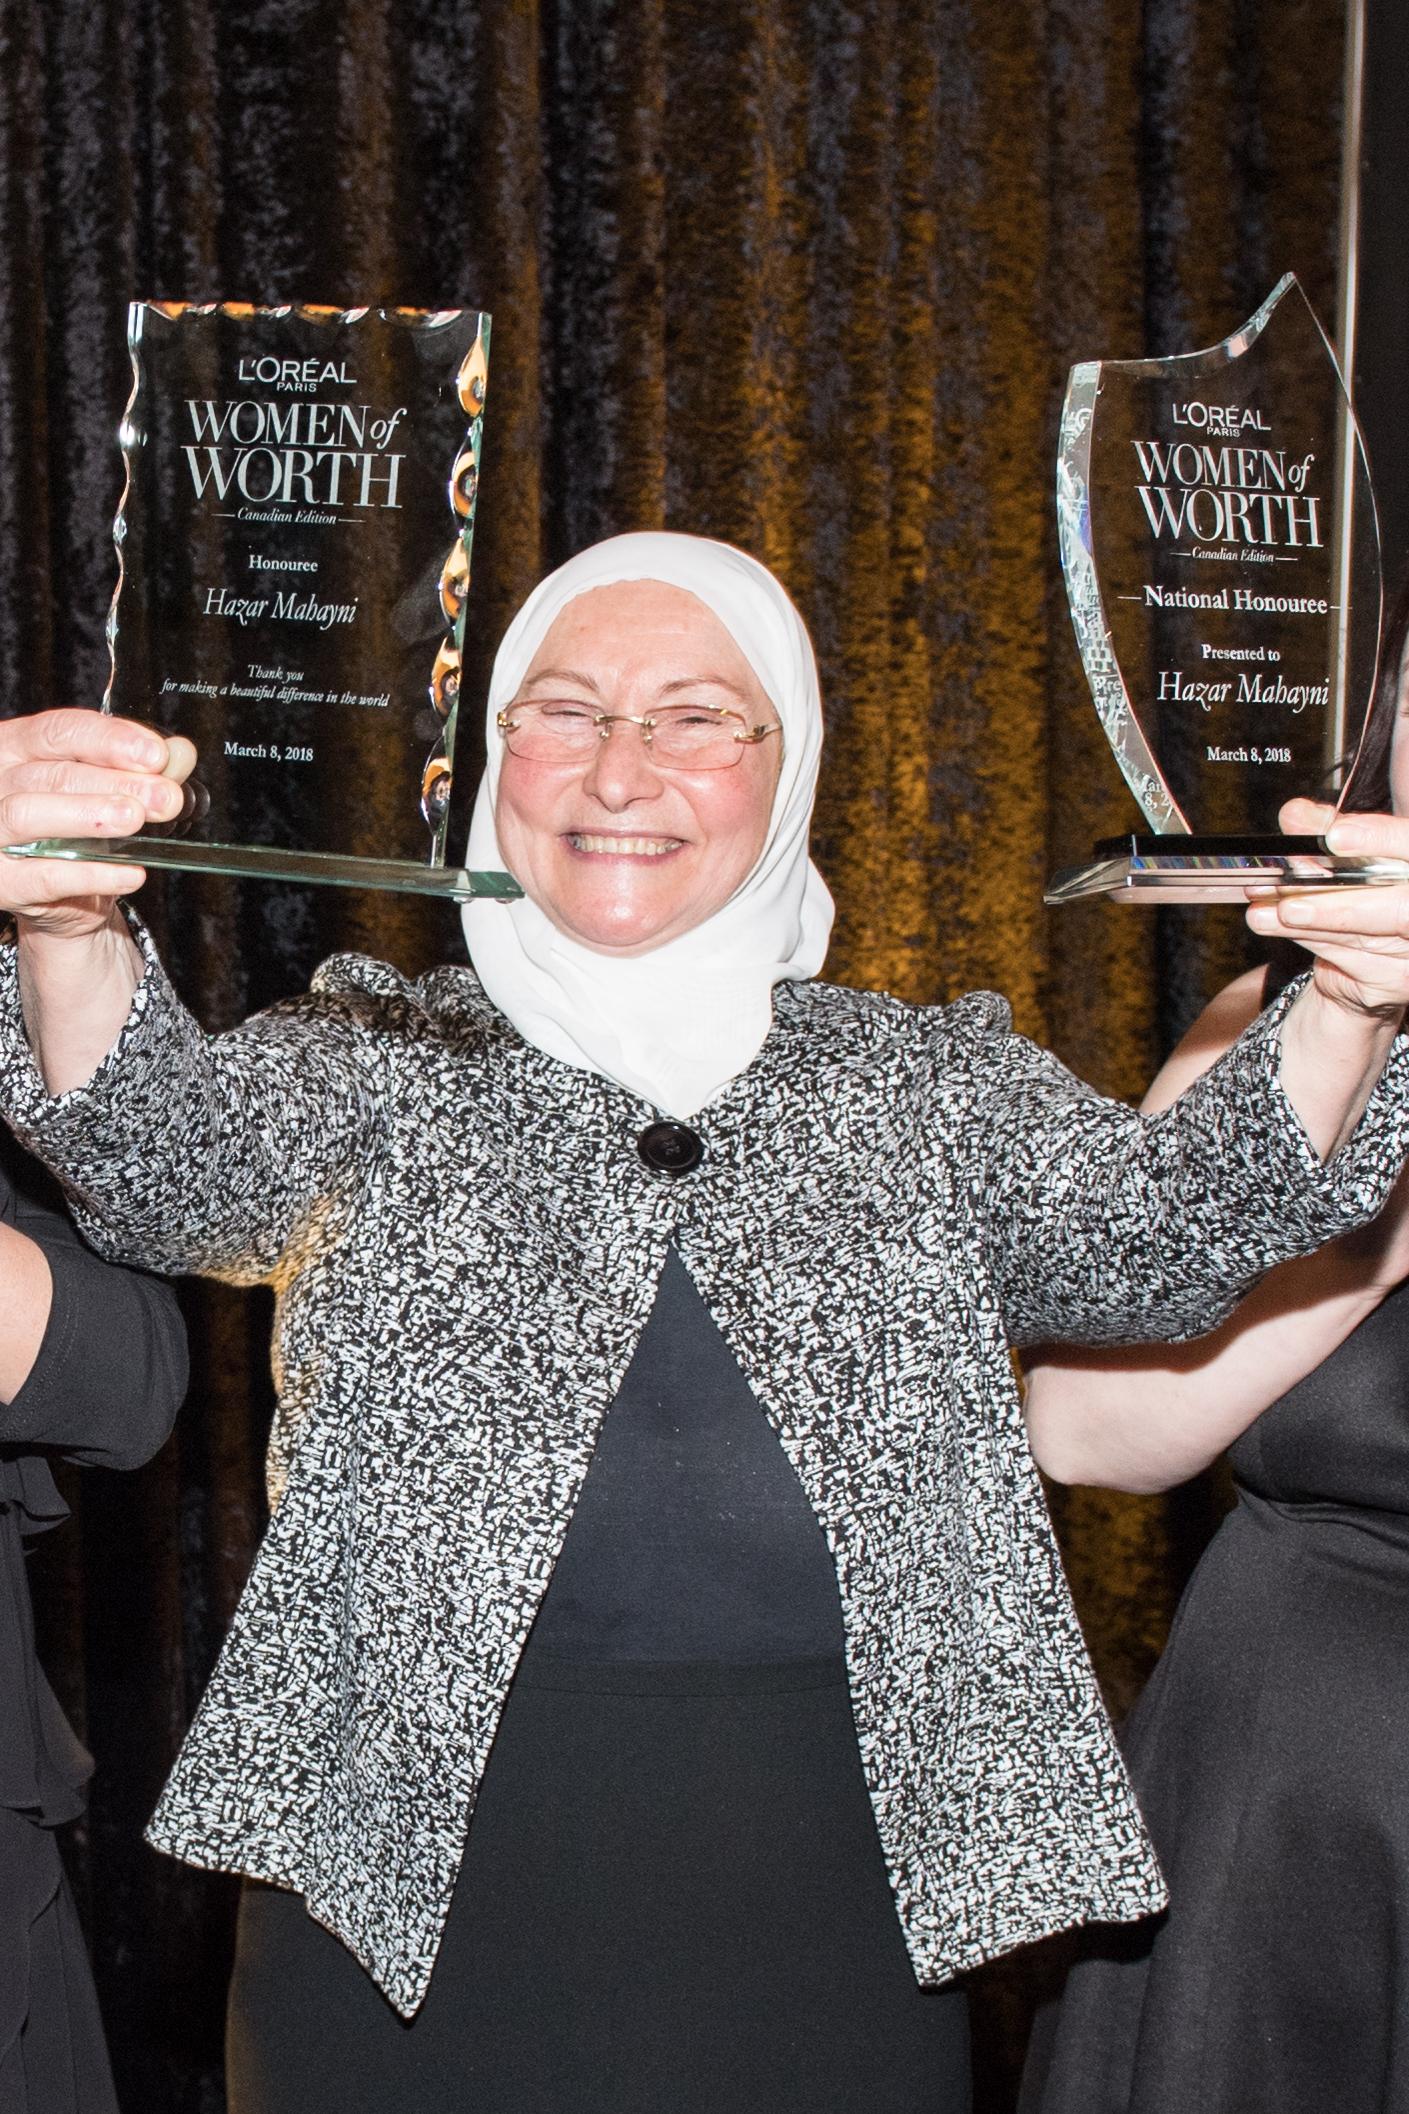 L'Oreal Women of Worth 2018